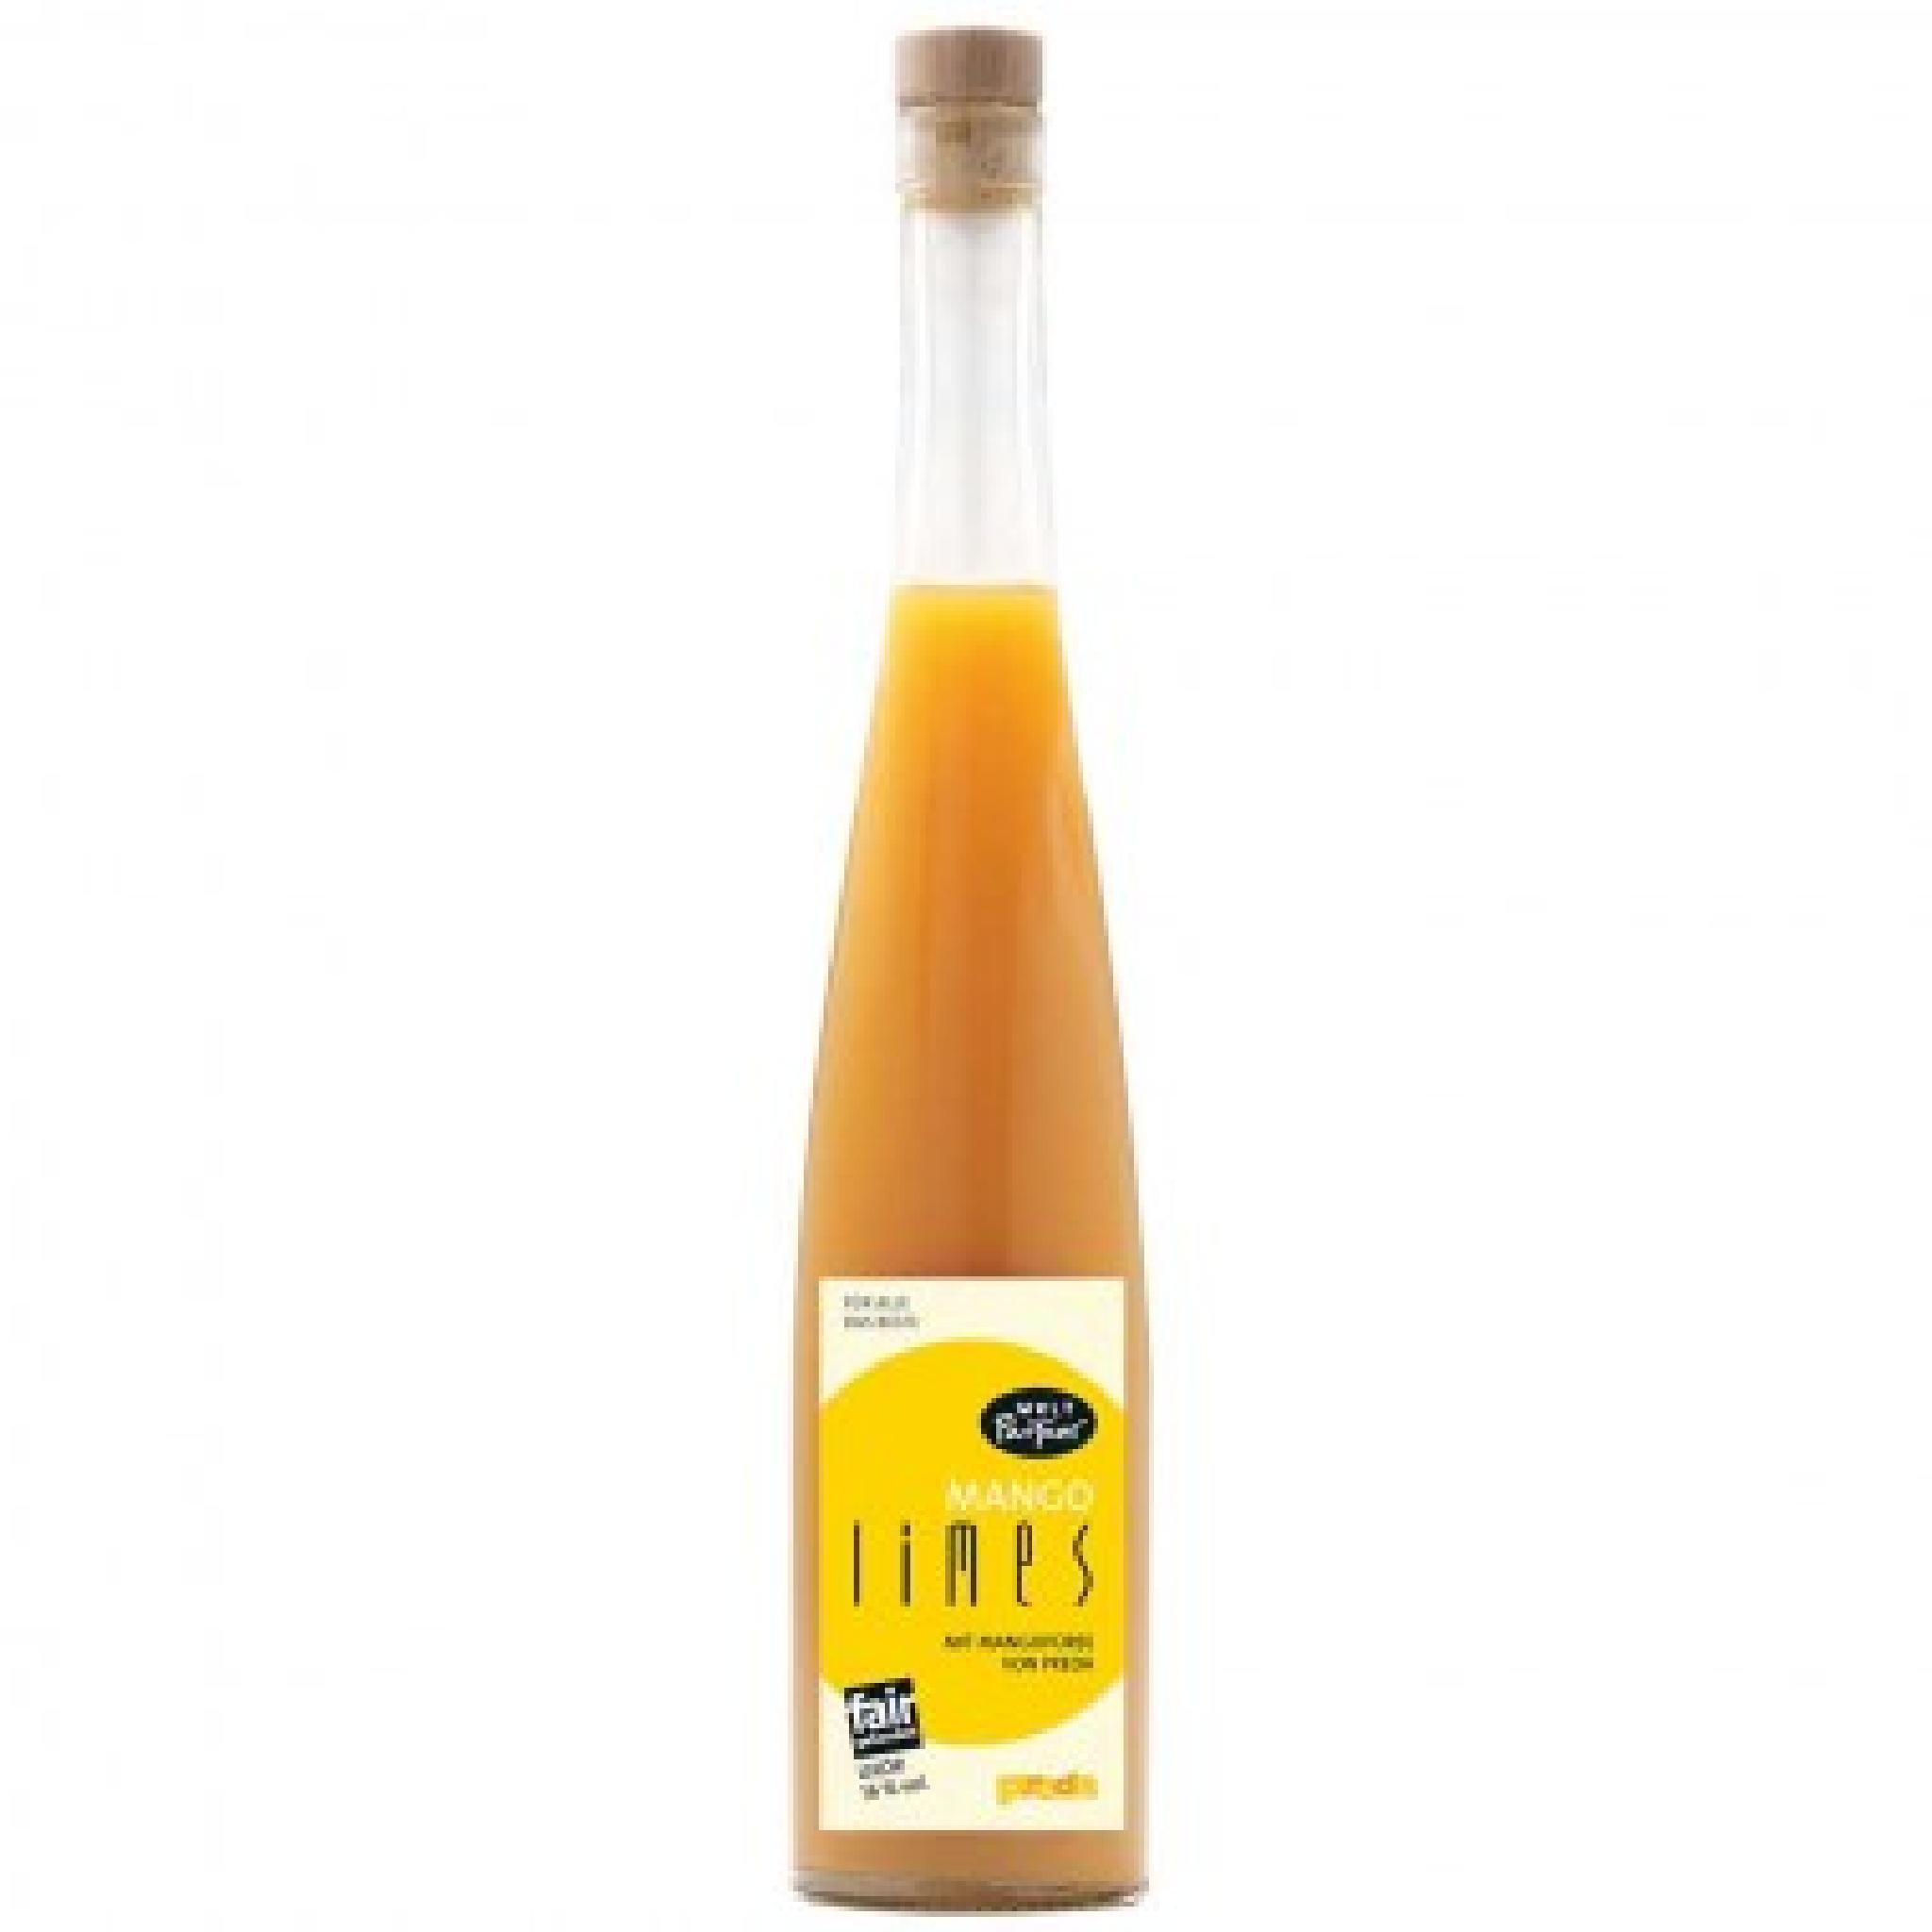 Mango-Limes Likör, 16%